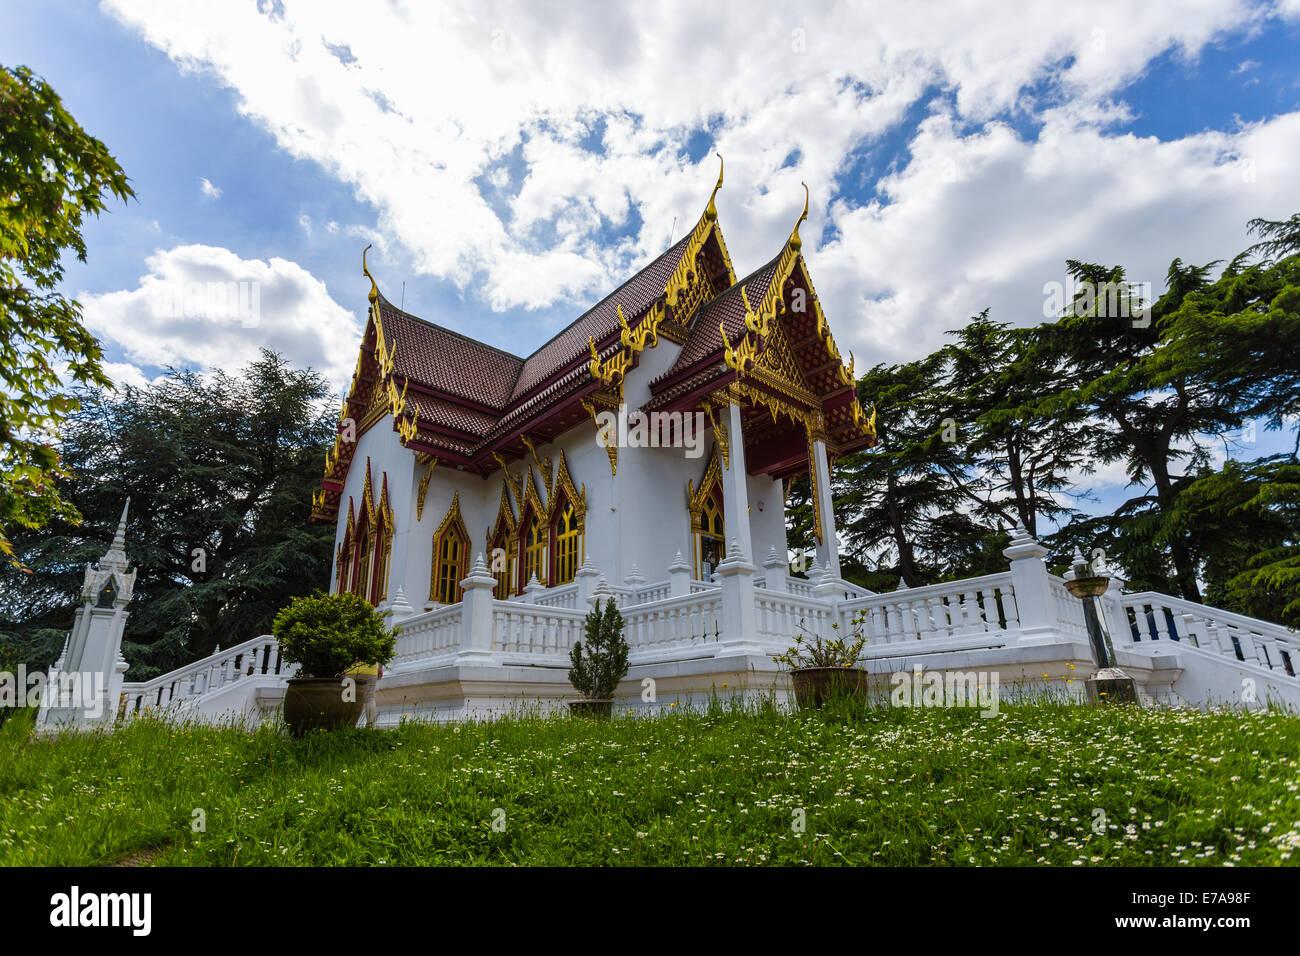 buddhapadipa buddhist temple wimbledon parkside london england united kingdom